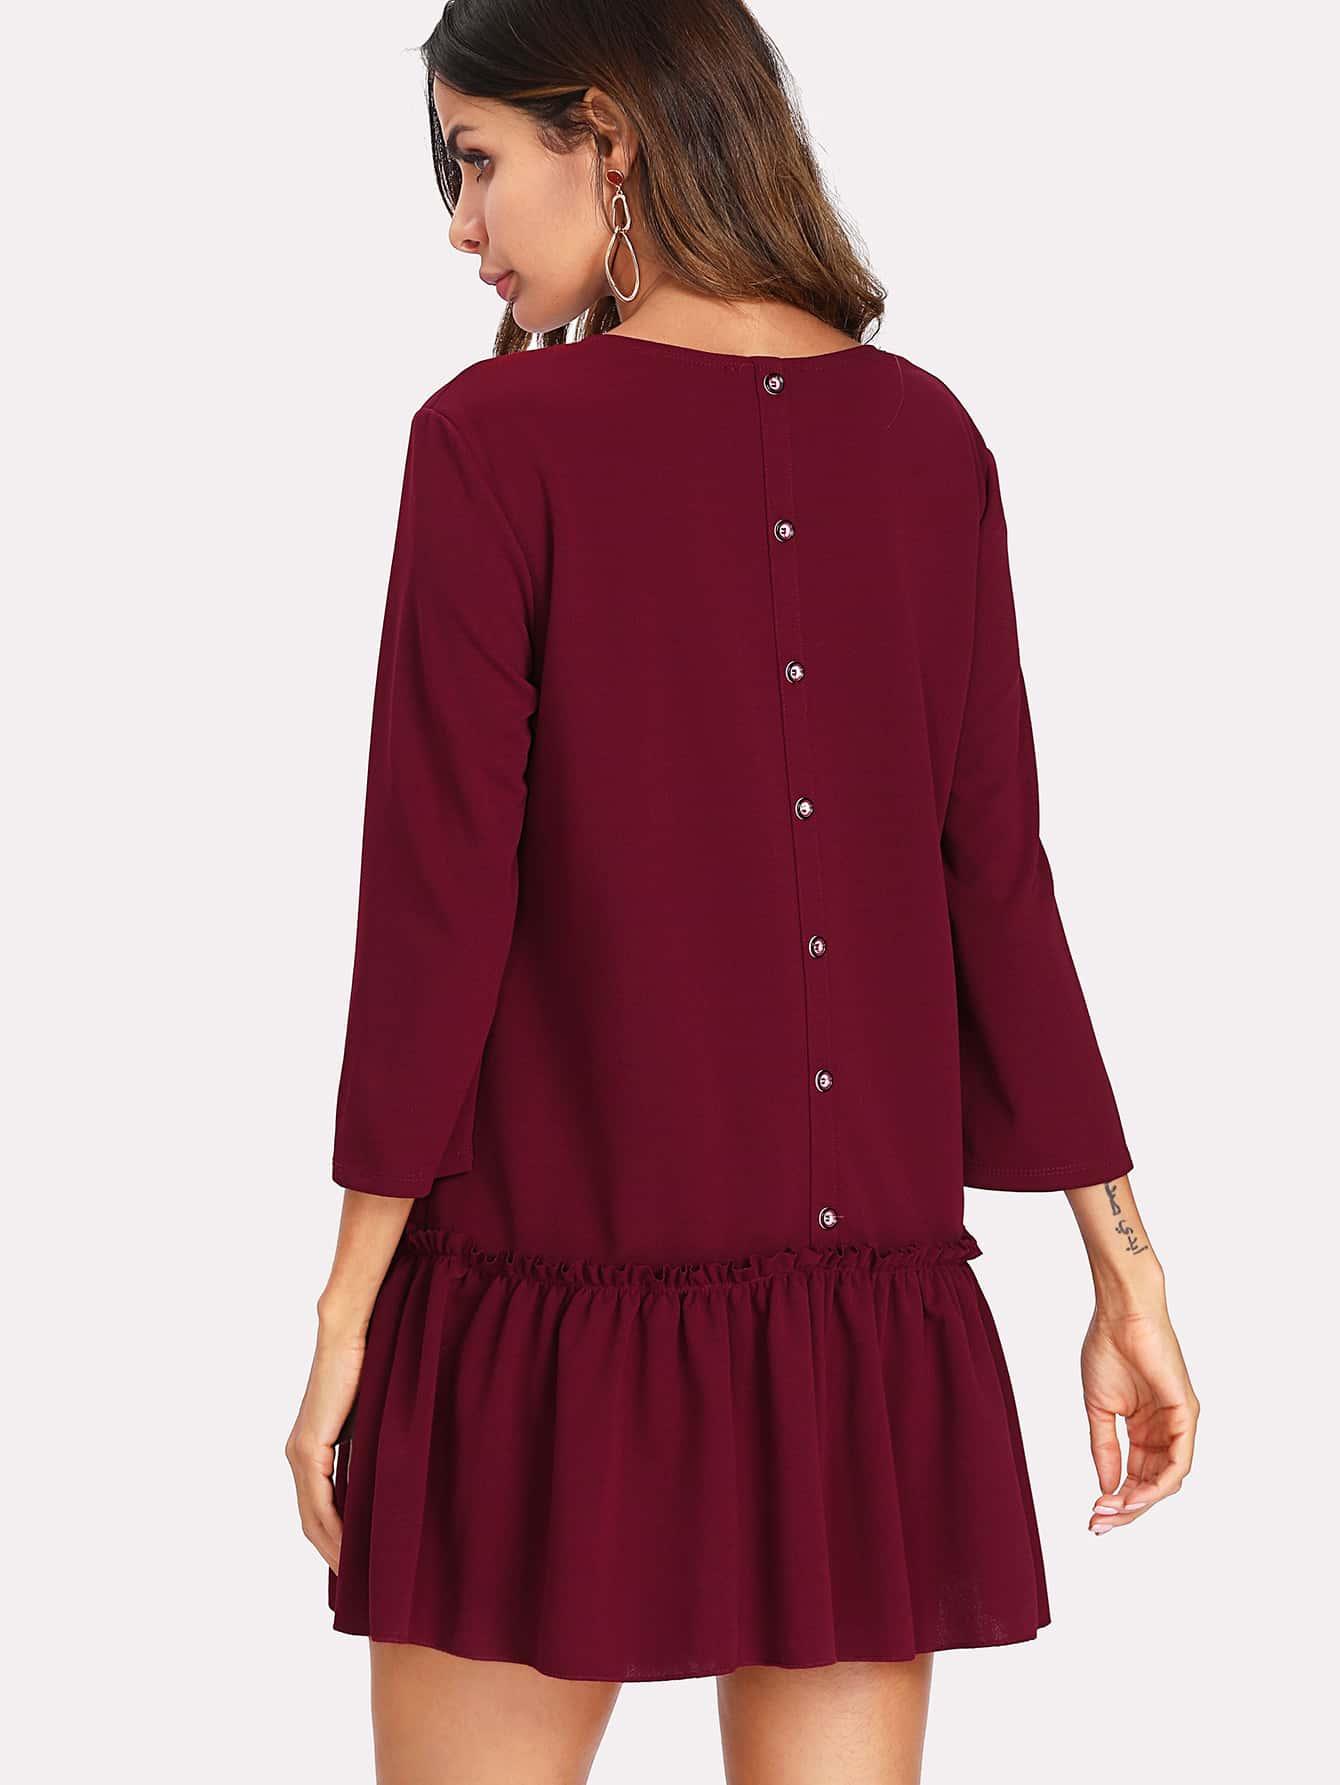 Ruffle Hem Solid Dress tied neck solid ruffle hem dress